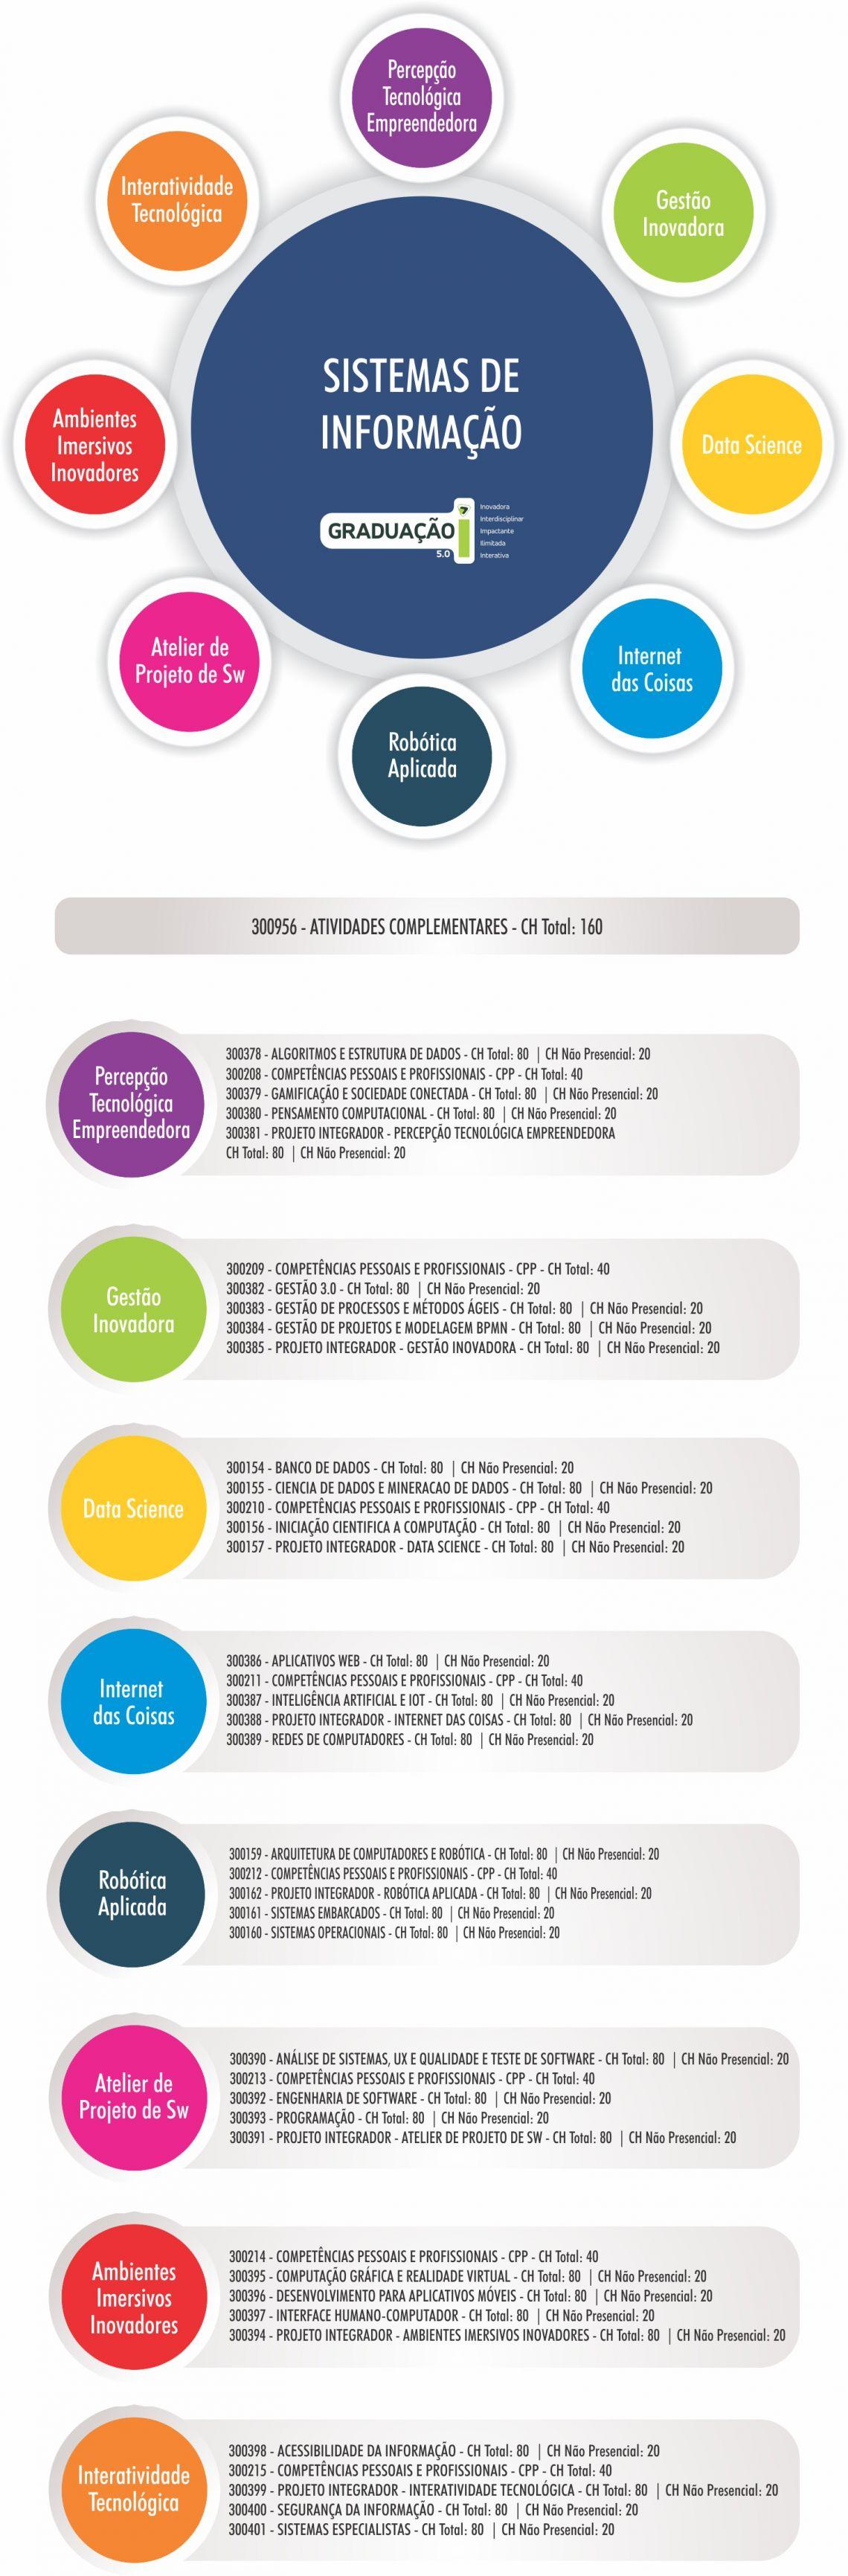 infografico_cur161350.jpg